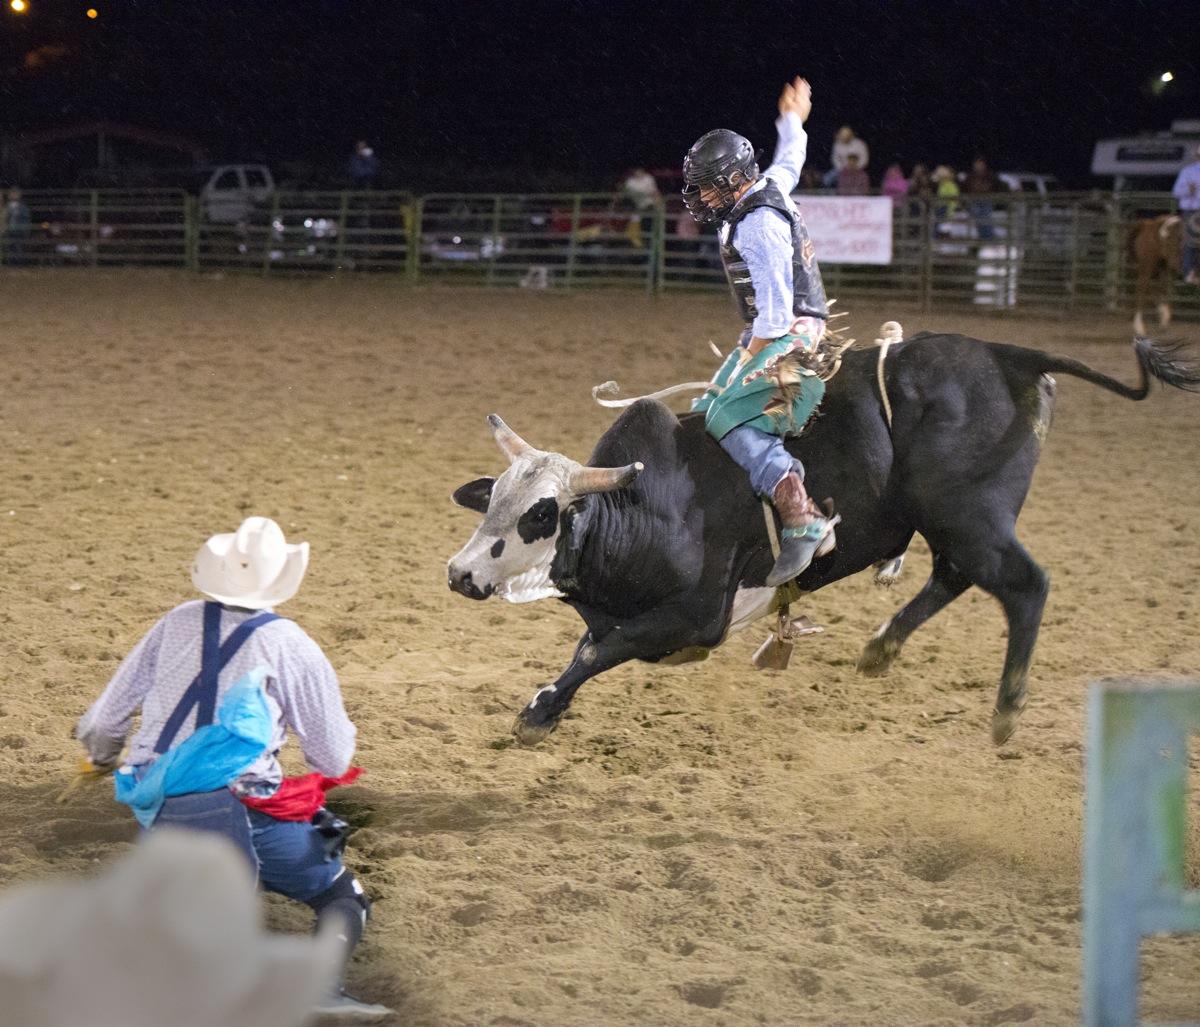 Rodeo_Buckingham_3.jpg